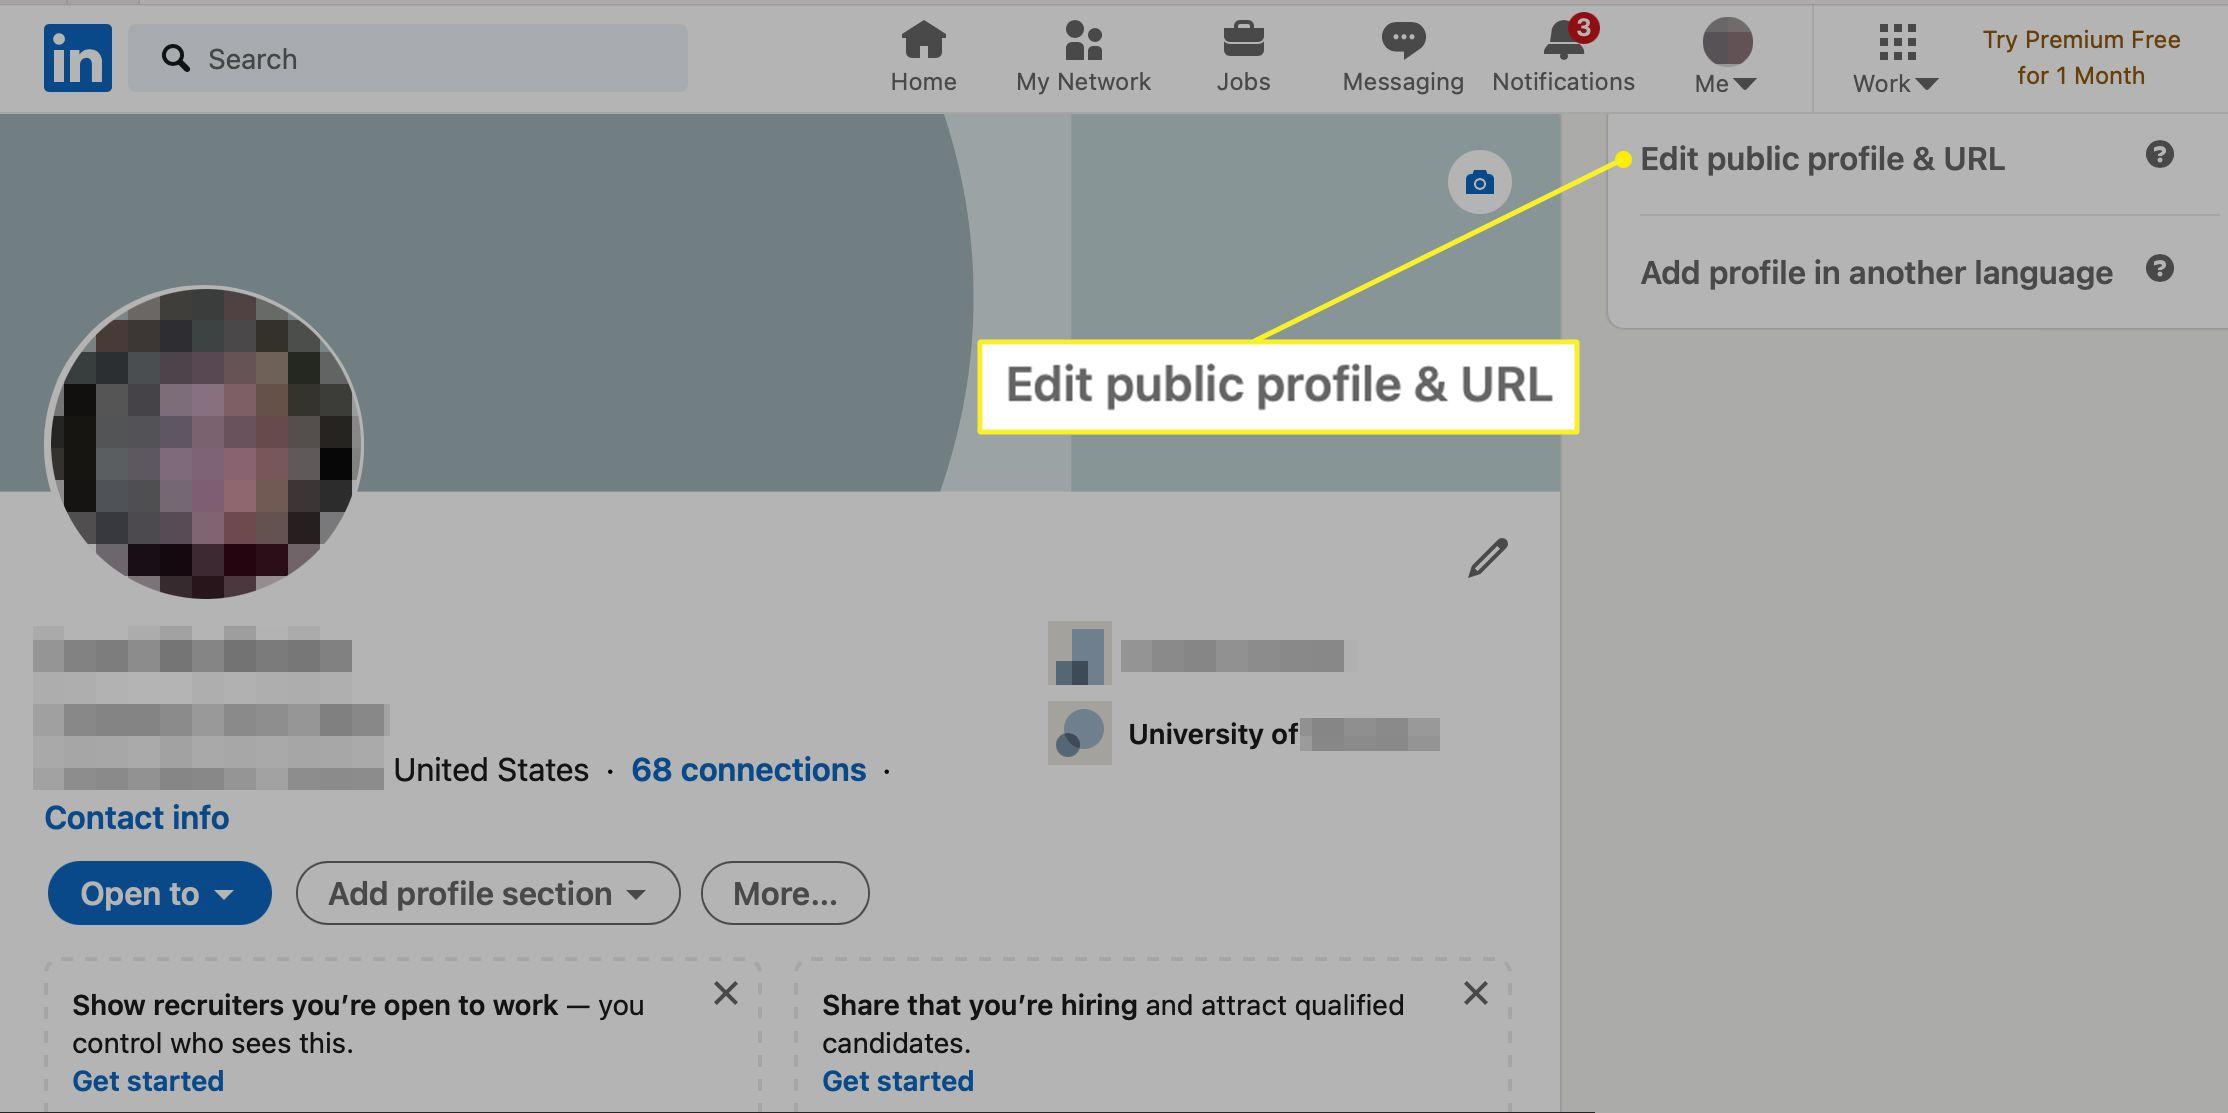 Edit public profile & URL selected in LinkedIn